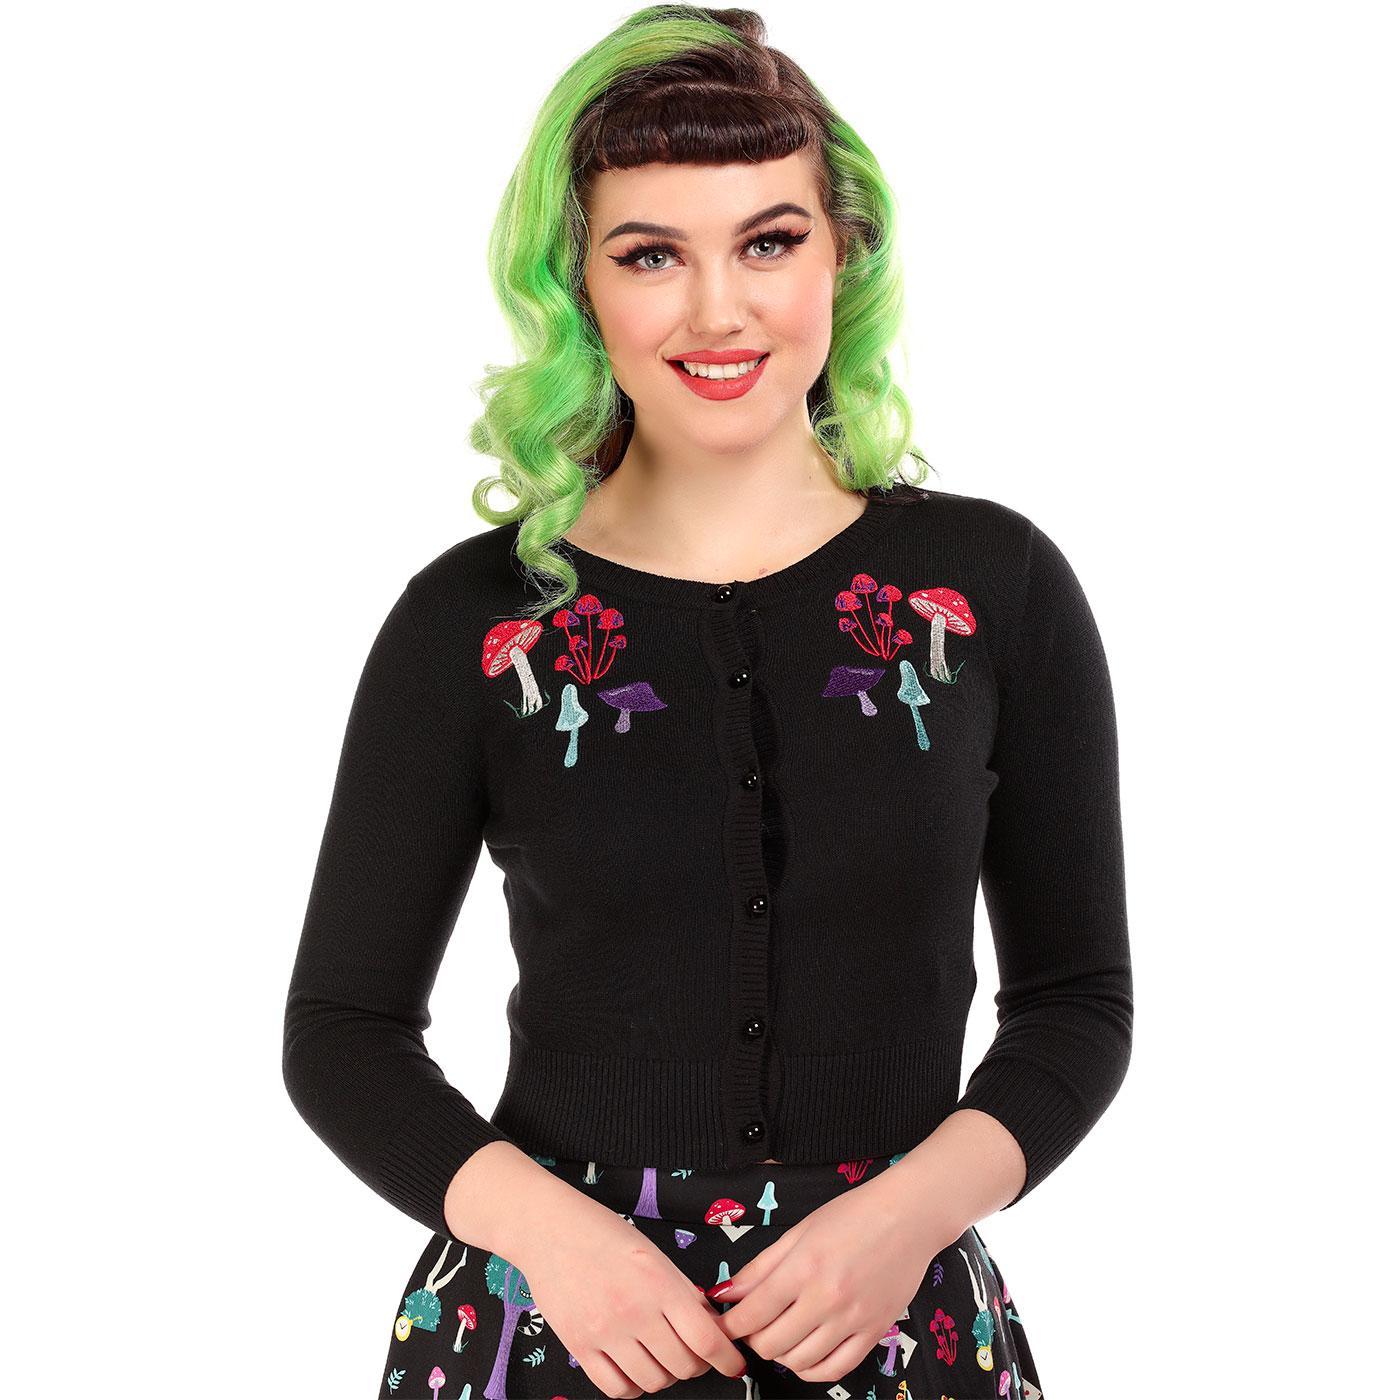 Jessie COLLECTIF Retro Mushrooms Knitted Cardigan